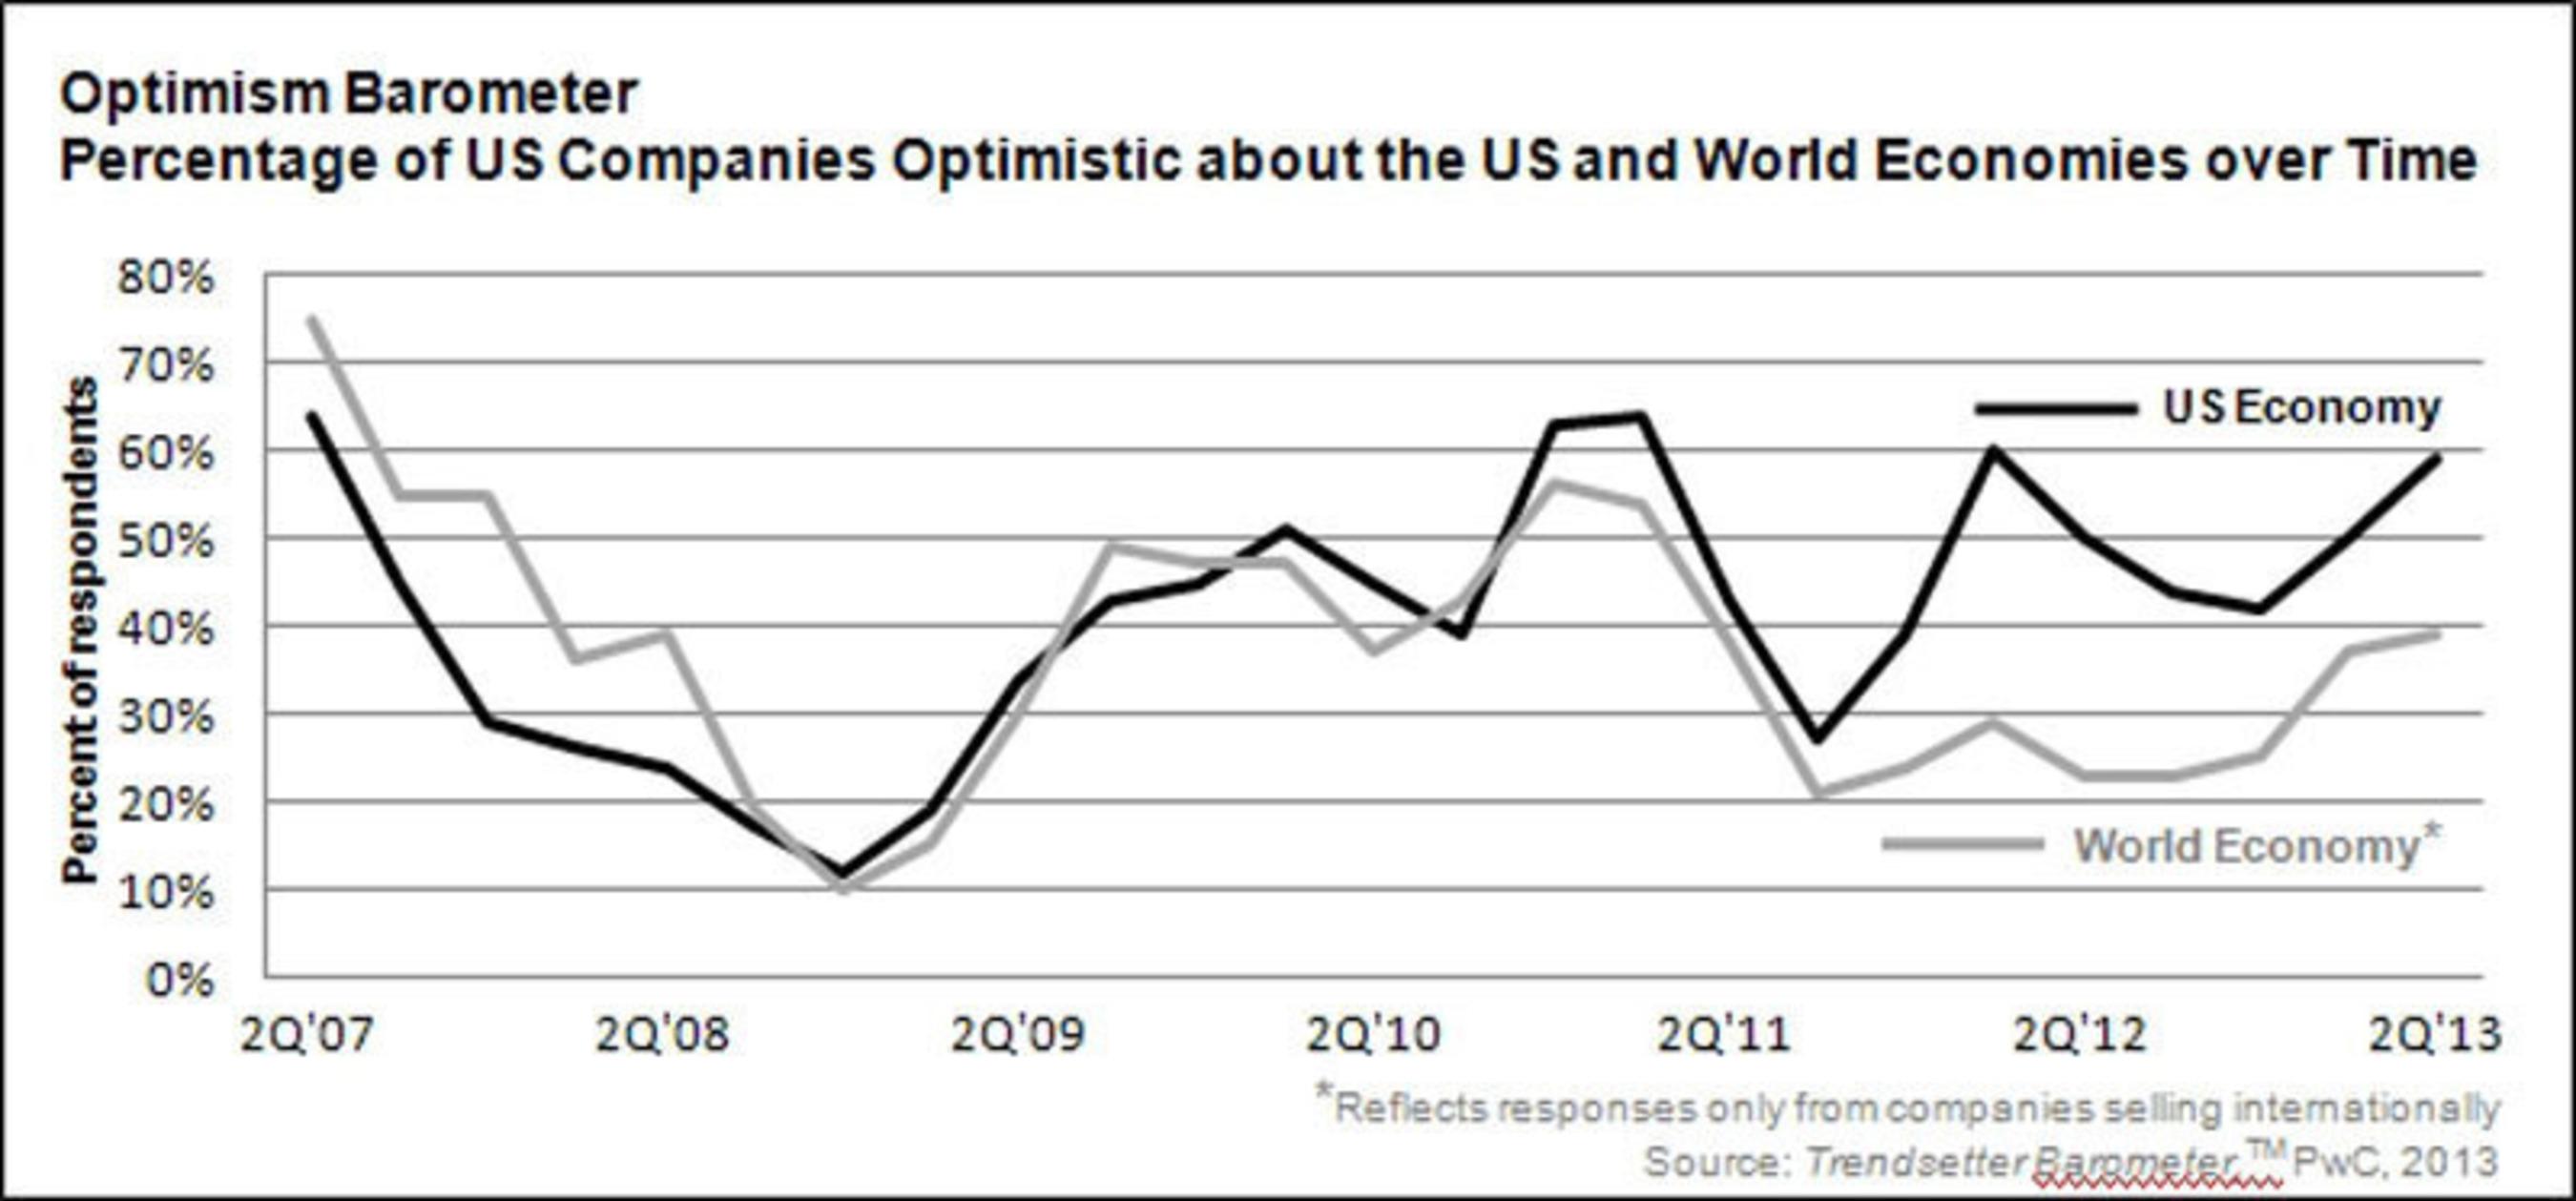 Private Companies Signal Rising Confidence in US Economy, PwC Survey Finds.  (PRNewsFoto/PwC US)